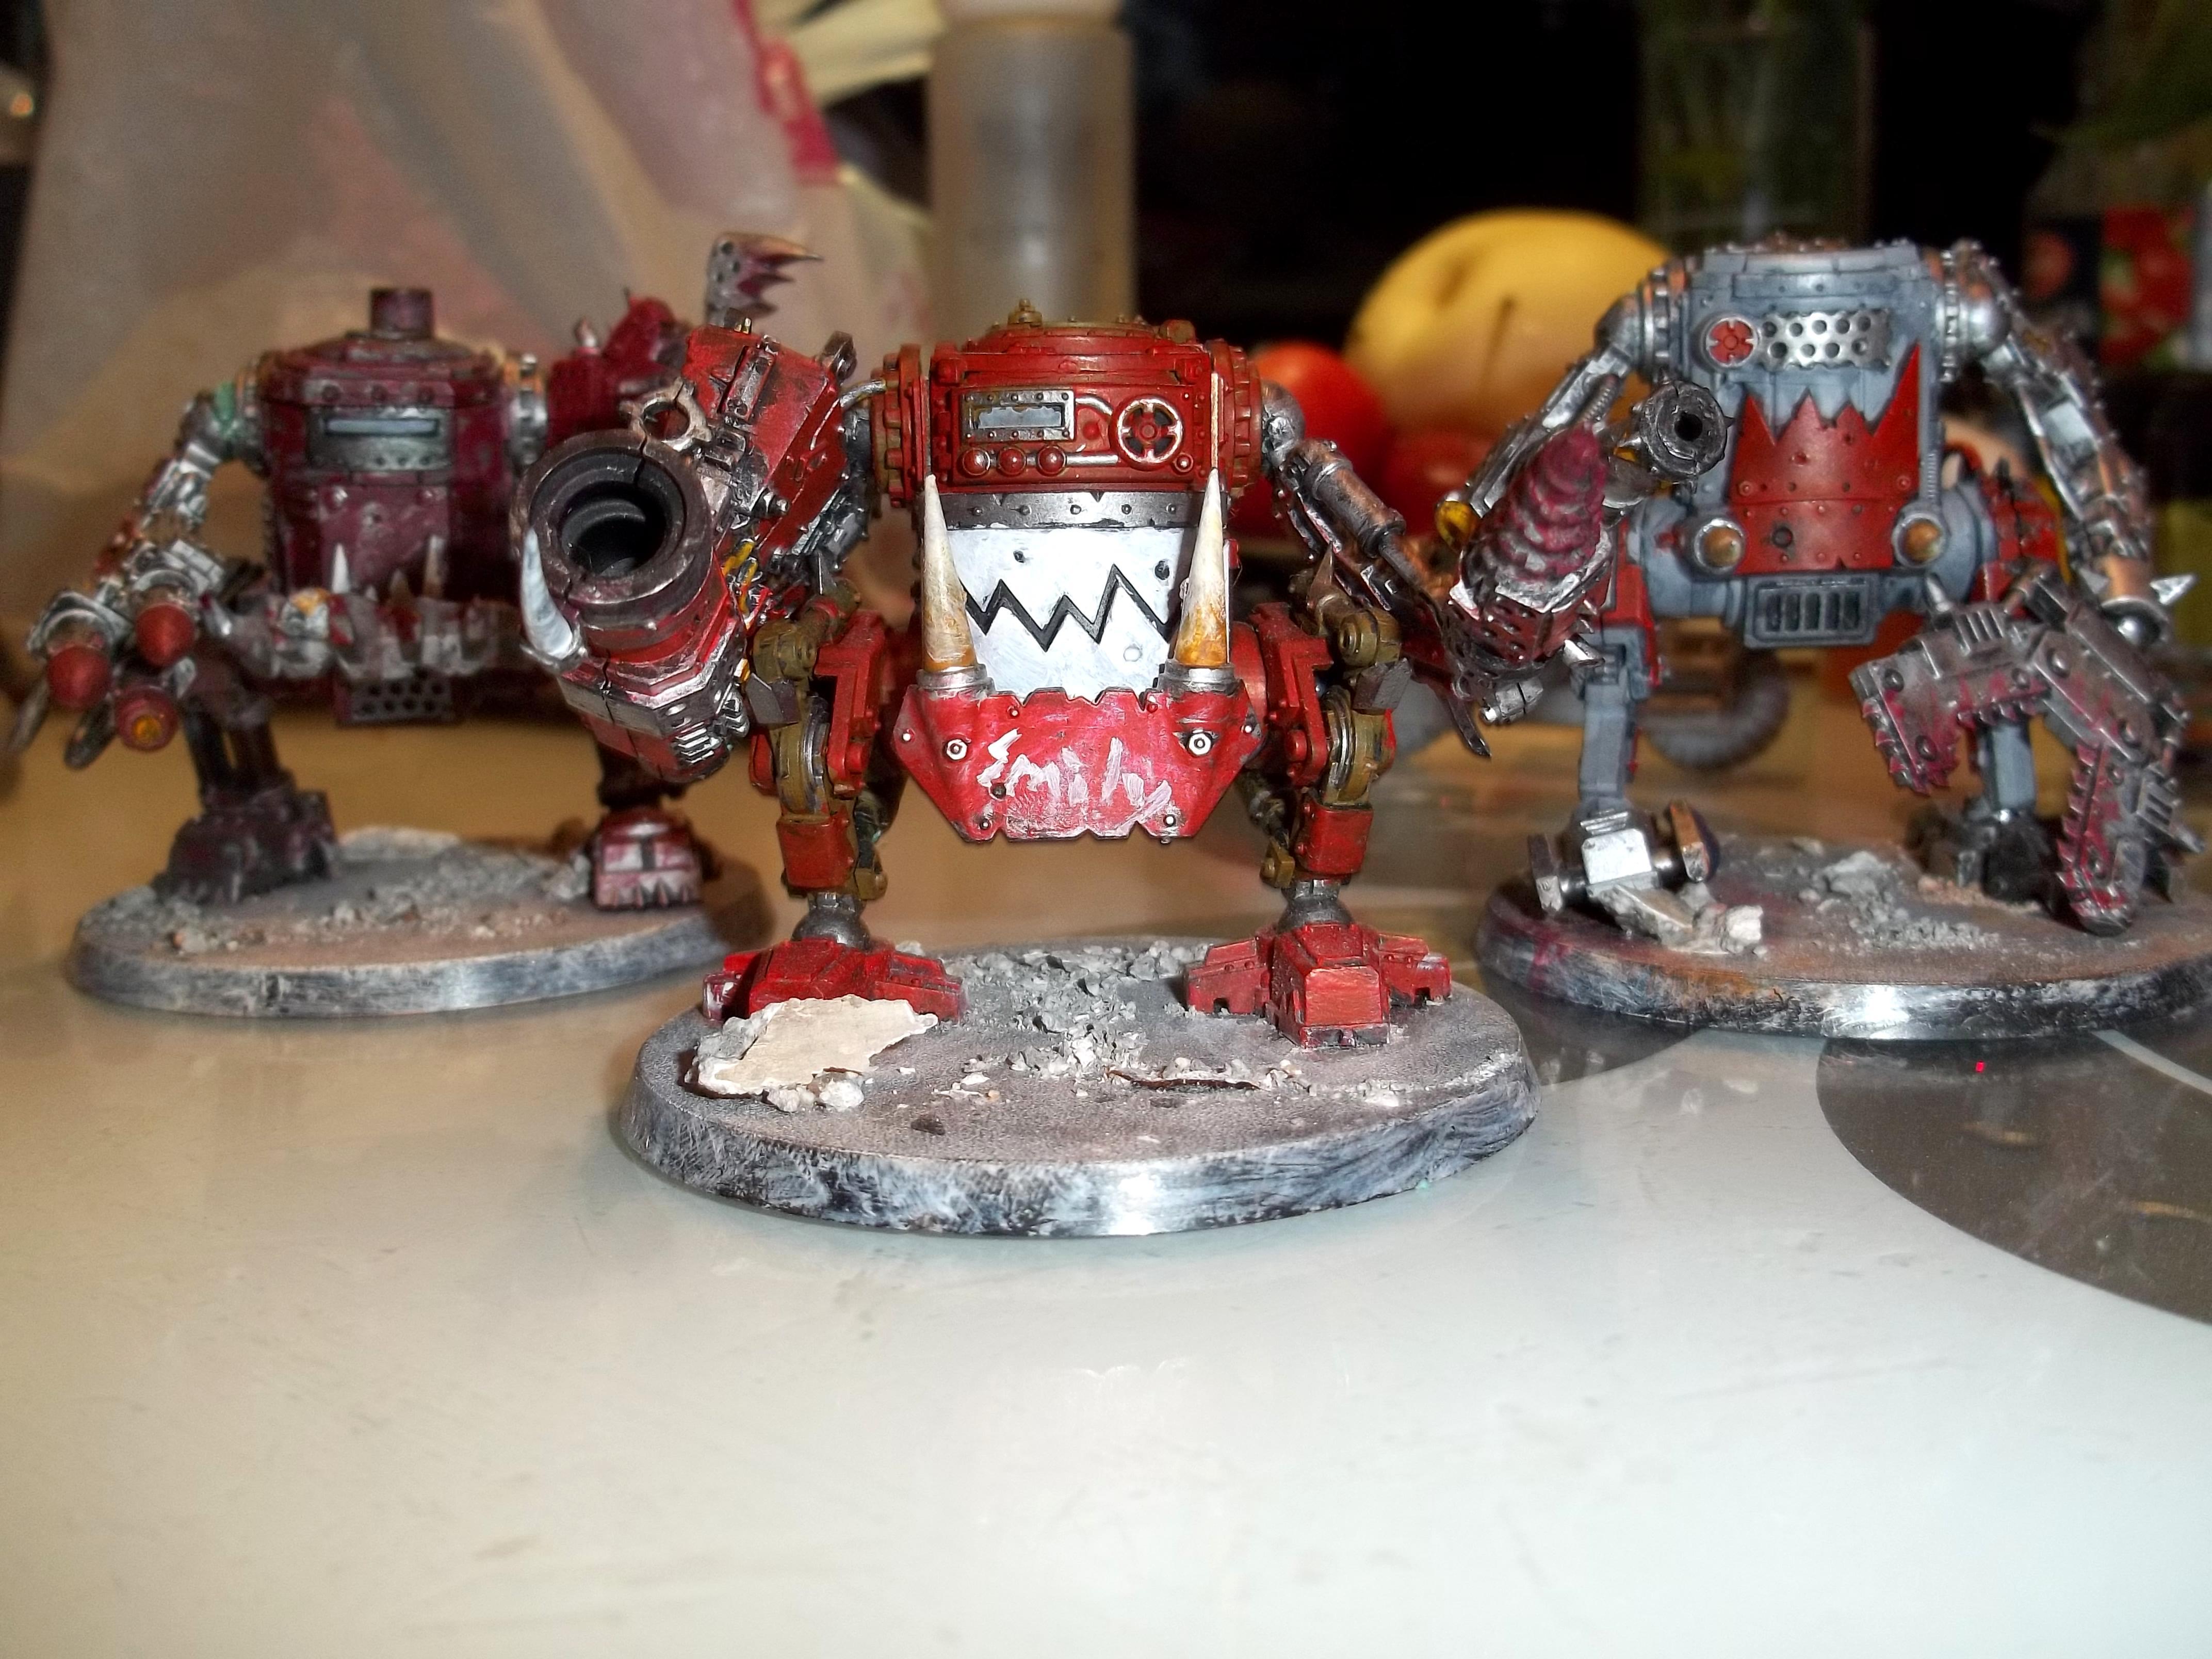 Greyblasta, Killakans, Megablasta, Orks, Painted, Redpaint, Rock Base, Smily, Tinkan, Warhammer 40,000